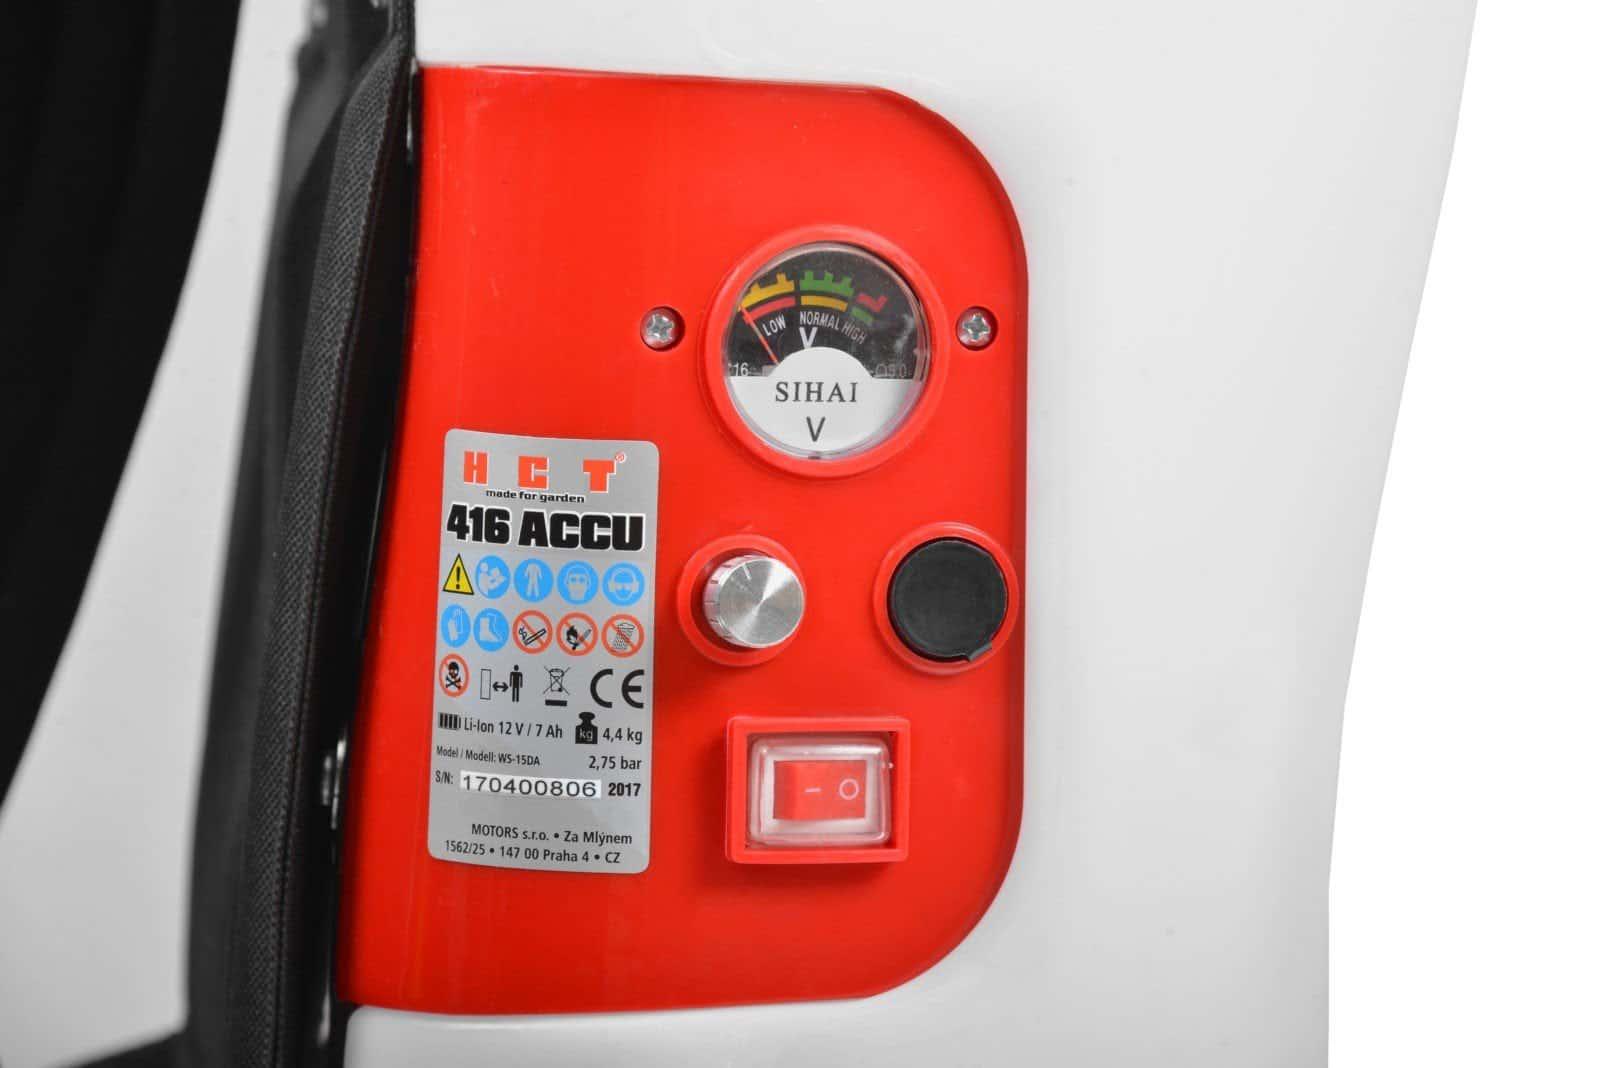 Pulverizador a Bateria HCT416 ACCU